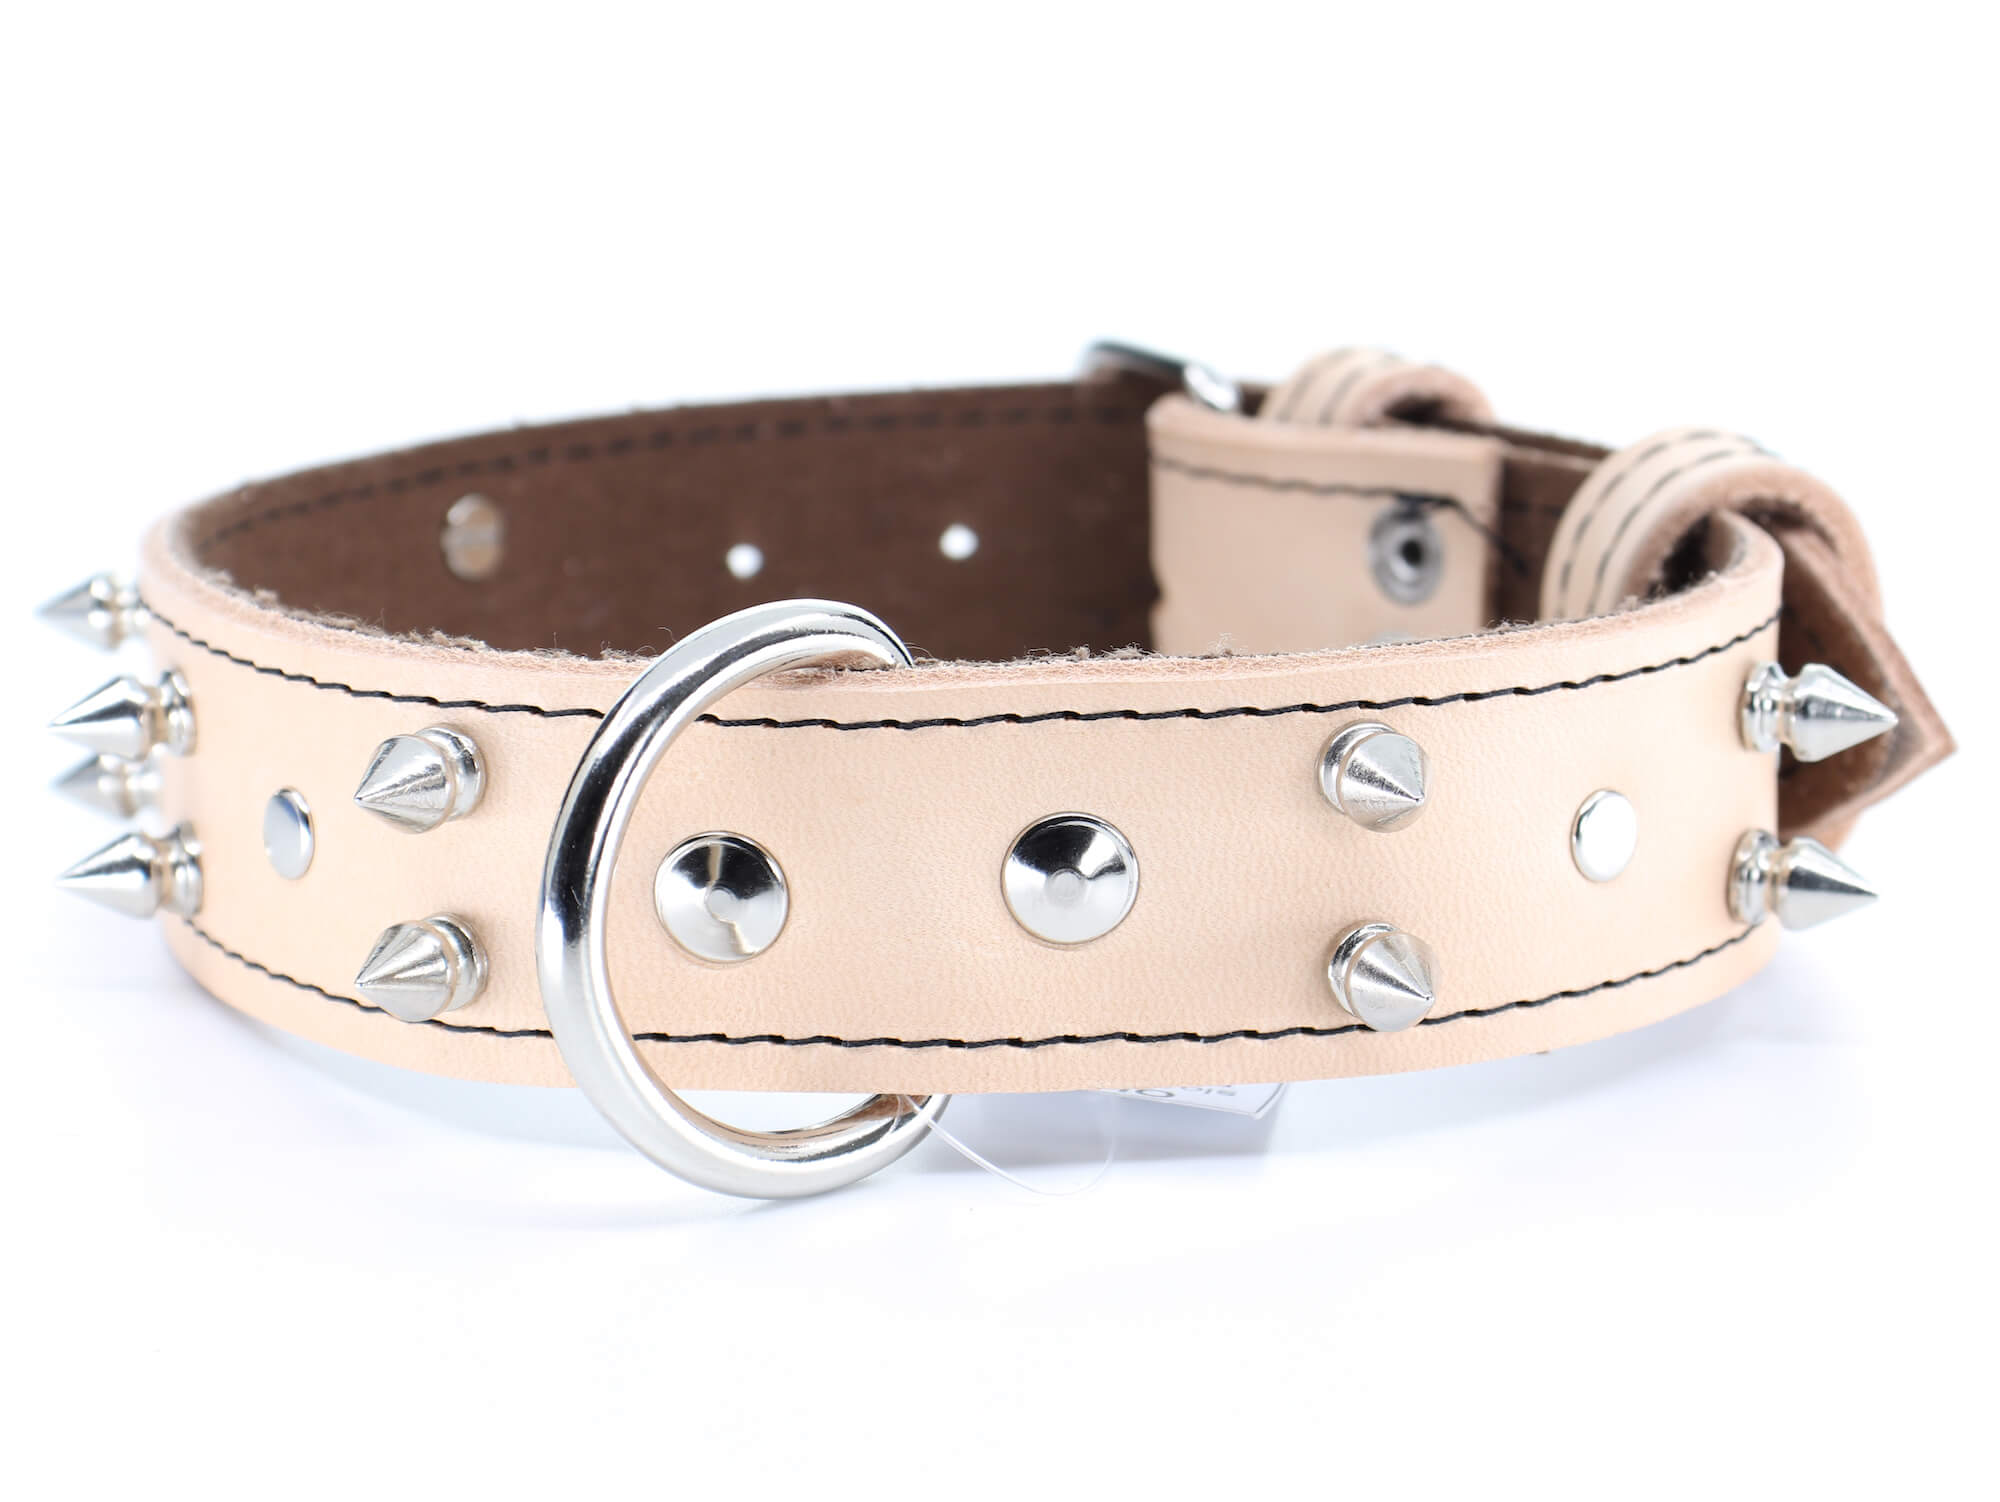 Palkar Apex kožený obojek pro psa s hroty   33 – 65 cm Barva: Béžová, Obvod krku: 39 - 48 cm, Šířka: 4 cm